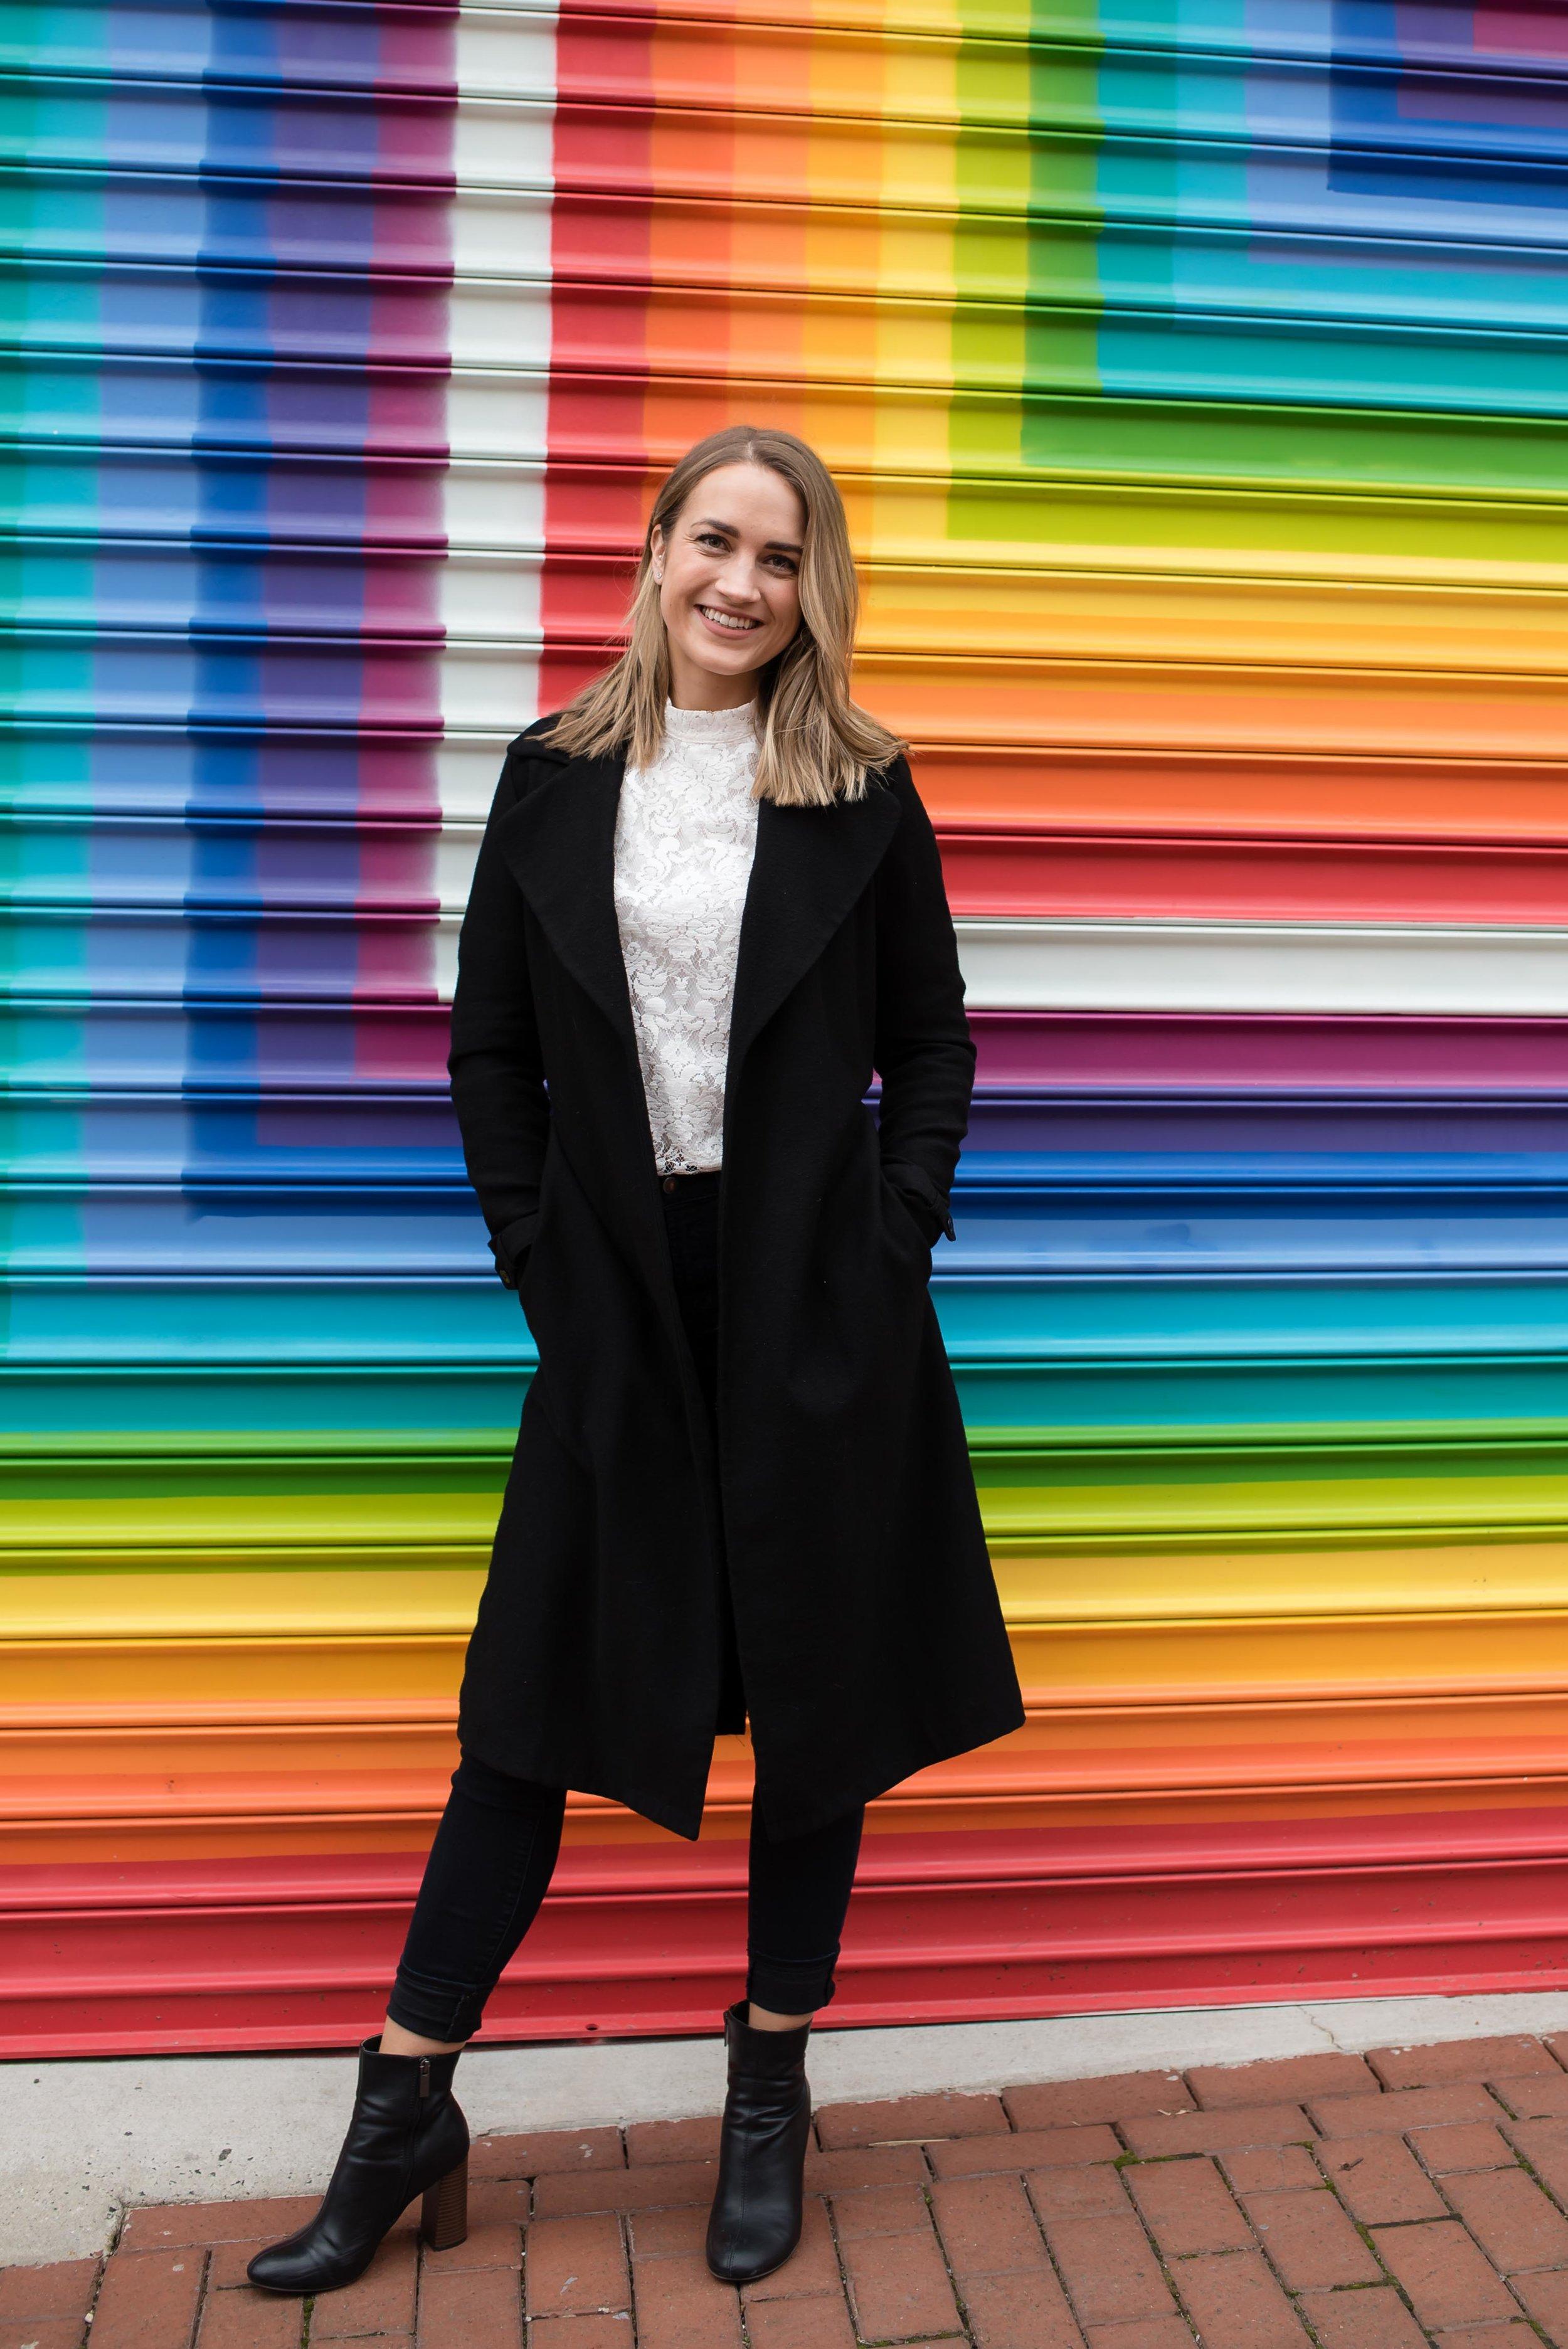 Erin-Kirkpatrick-Fabio-Photography-2018-JVL-Headshots-Jan21-171.jpg